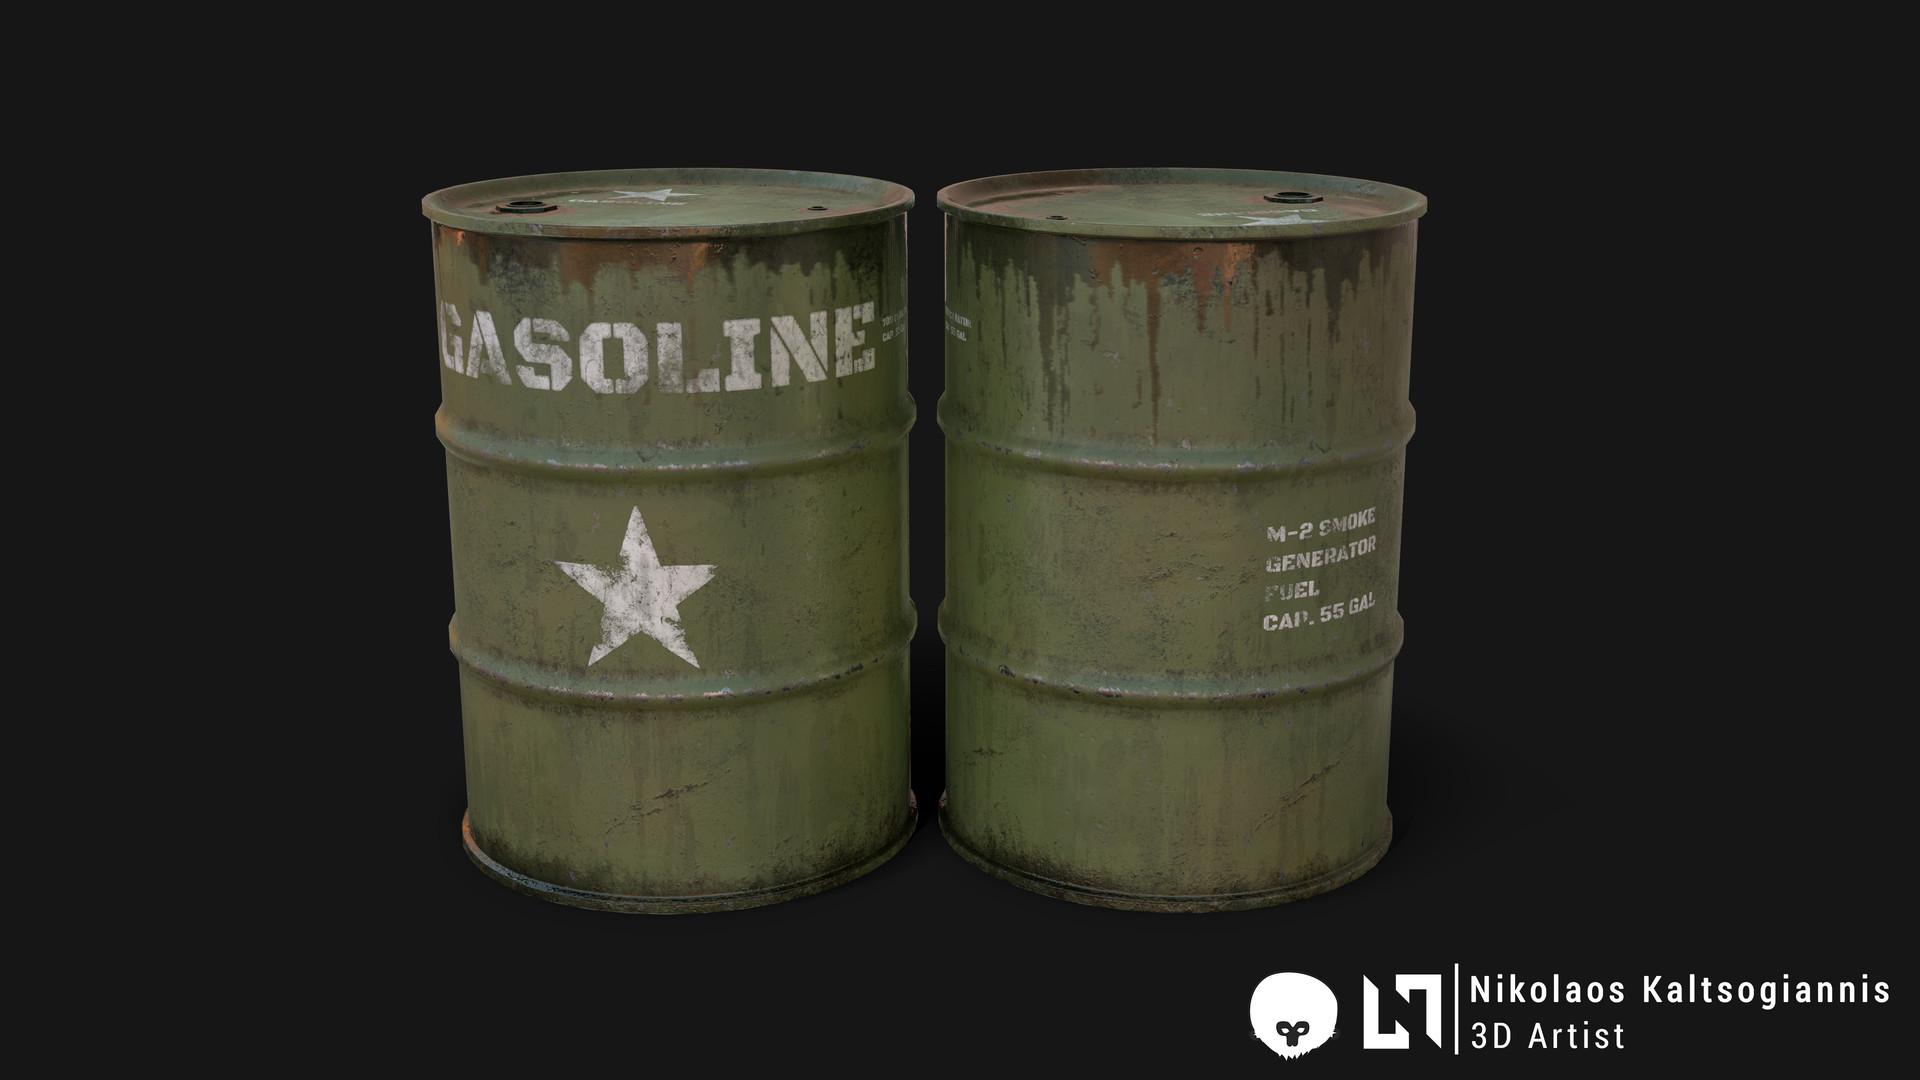 Nikolaos kaltsogiannis steel barrel 01